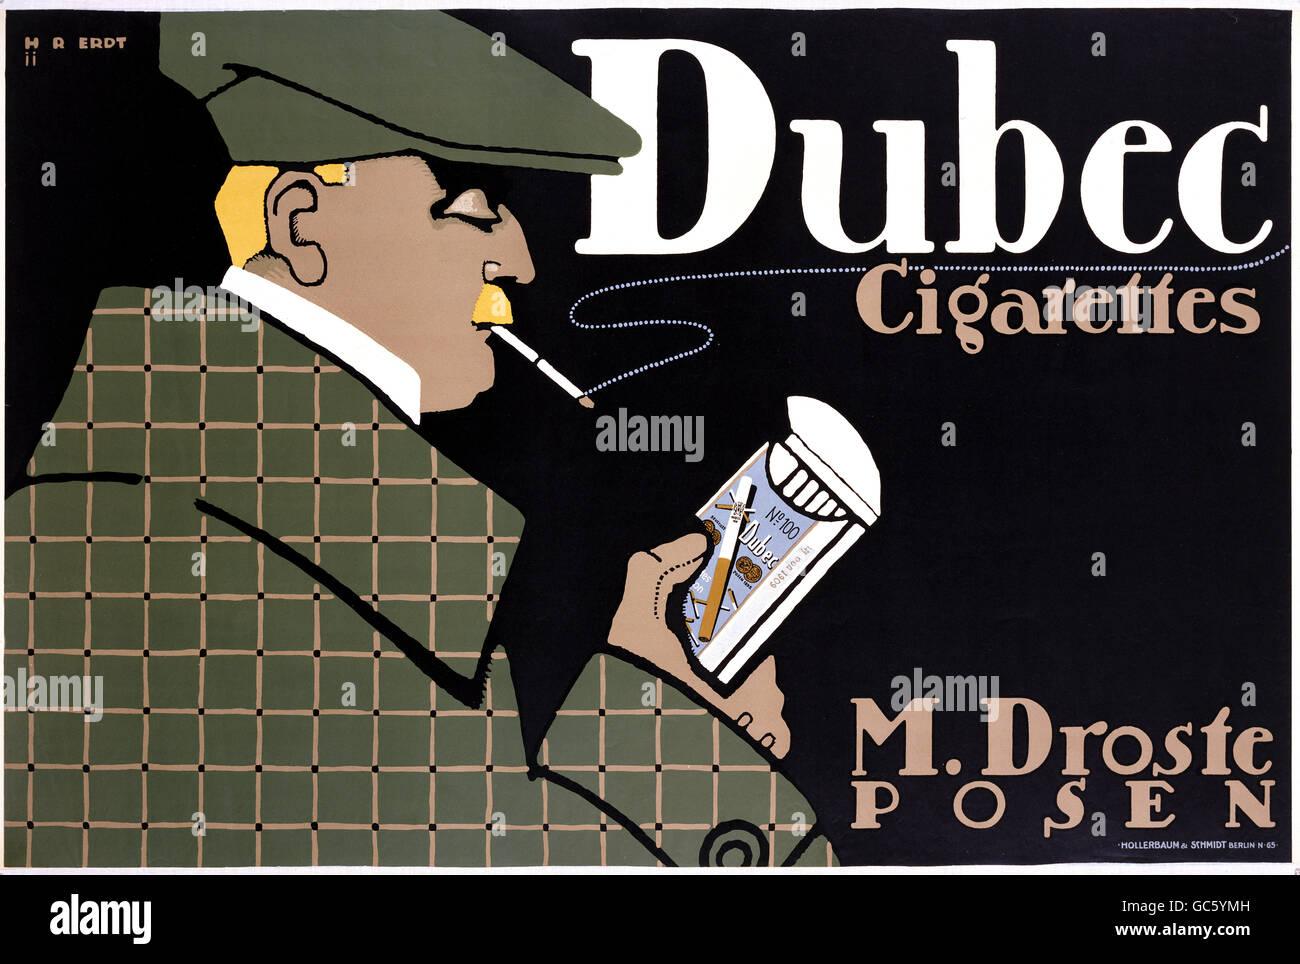 advertising, tobacco, cigarettes, 'Dubec Cigarettes', M. Droste, Posen, poster, circa 1910, Additional-Rights - Stock Image